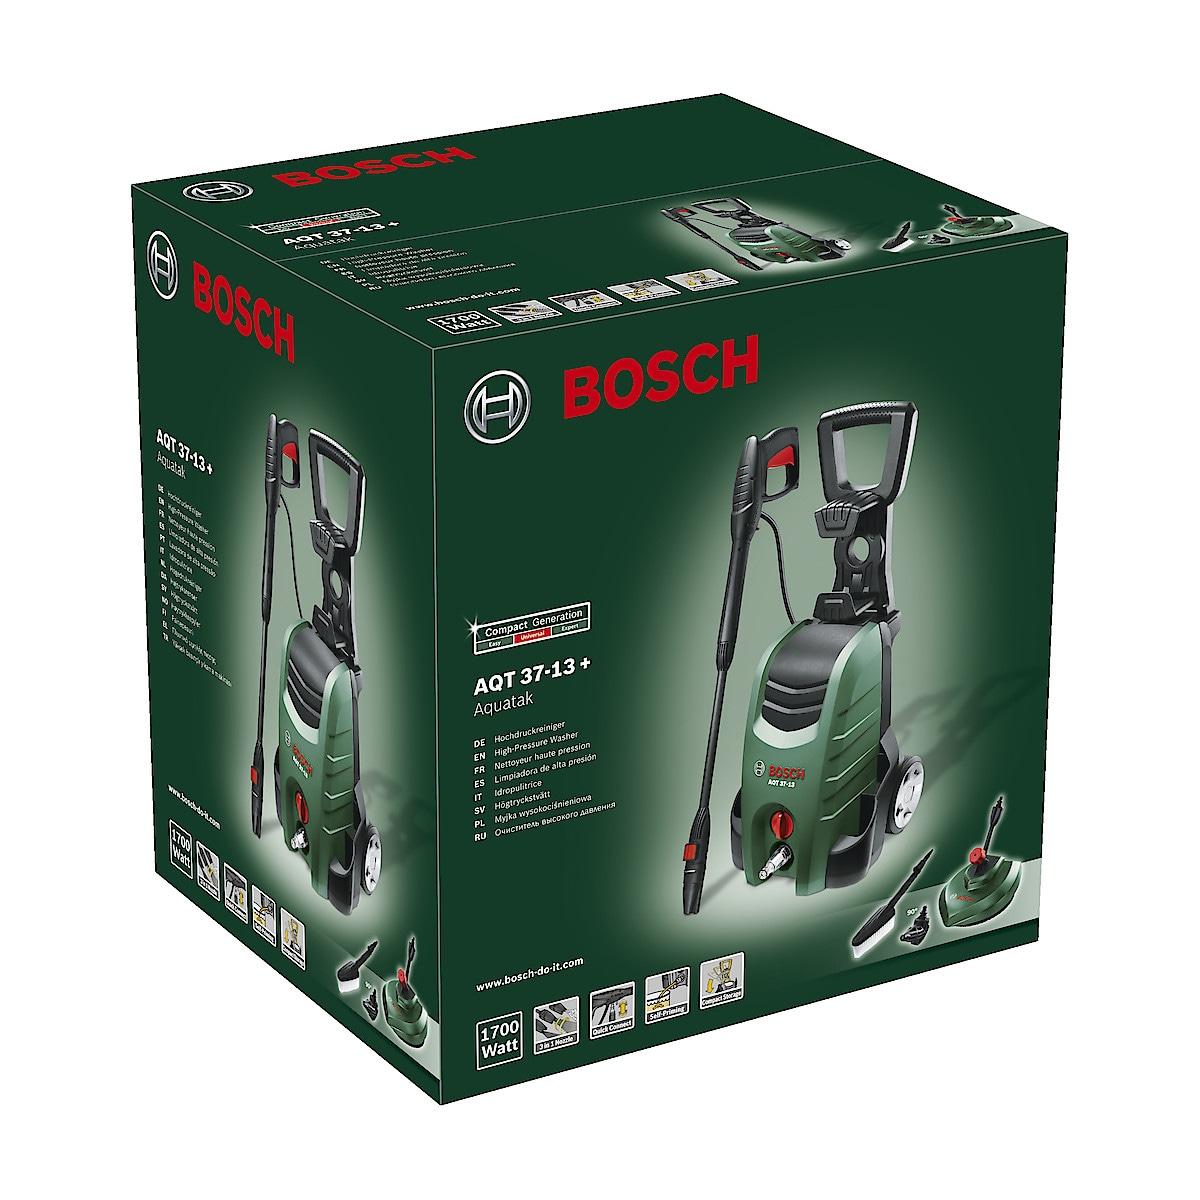 Bosch AQT 37-13+, høytrykkspyler